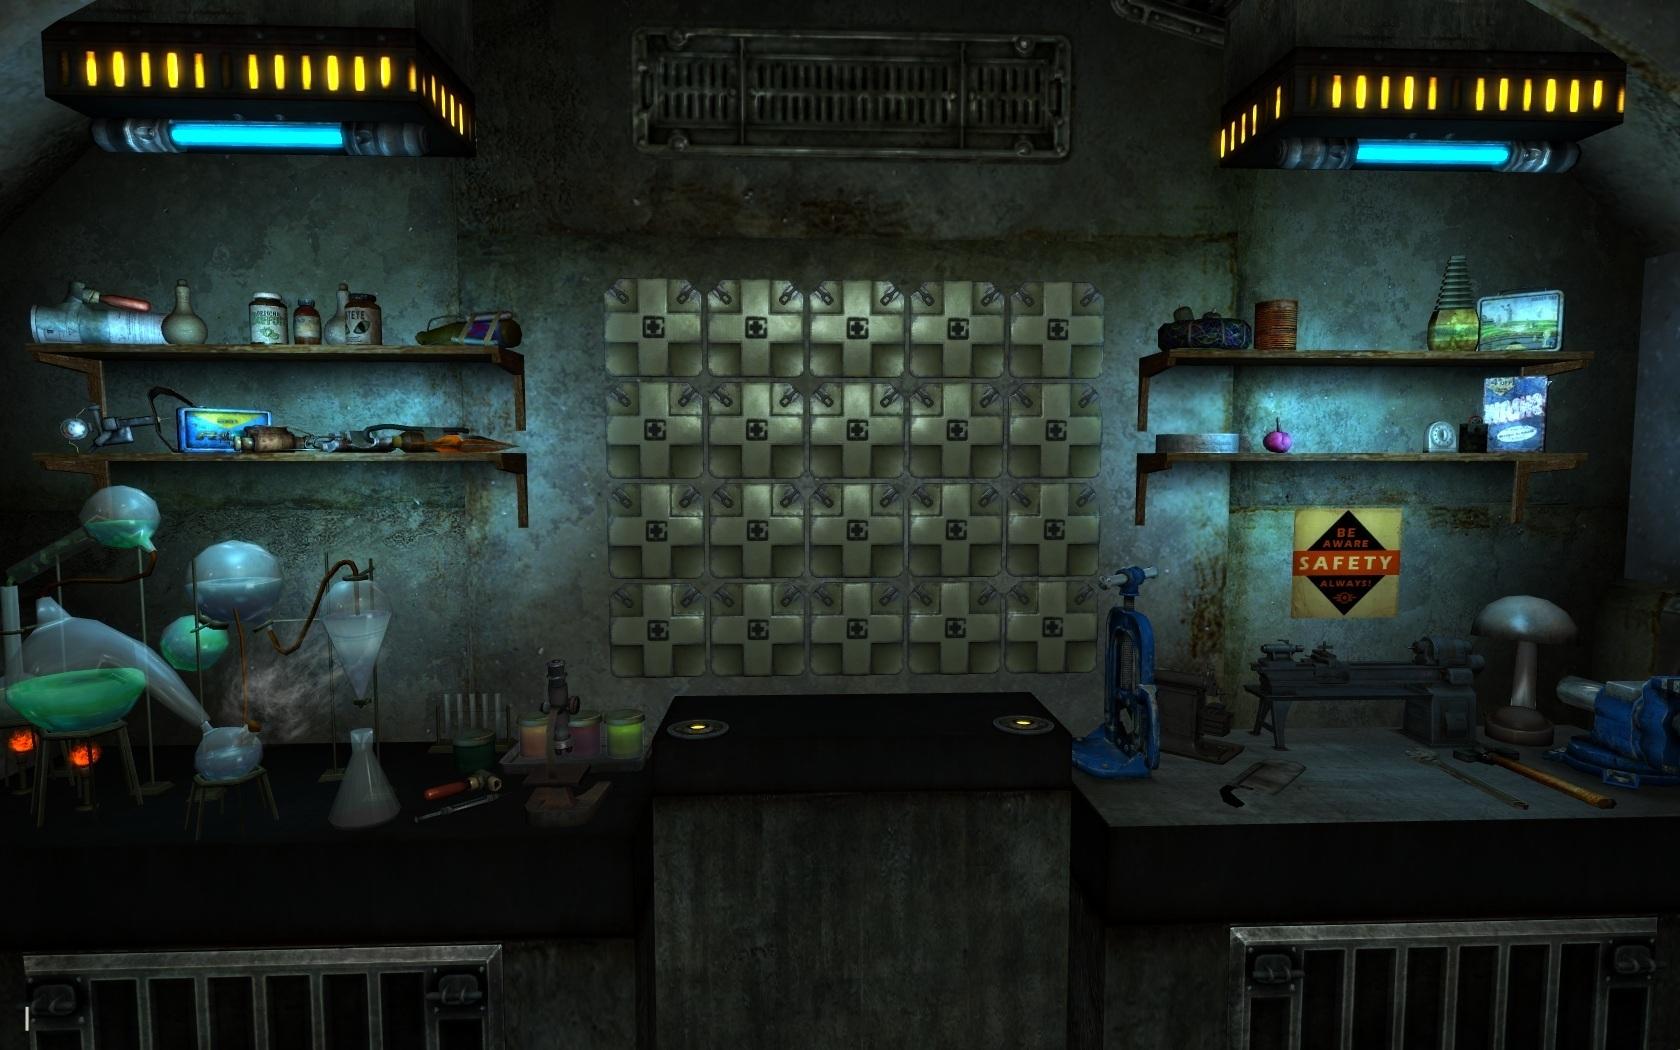 Fallout new vegas full casino mod